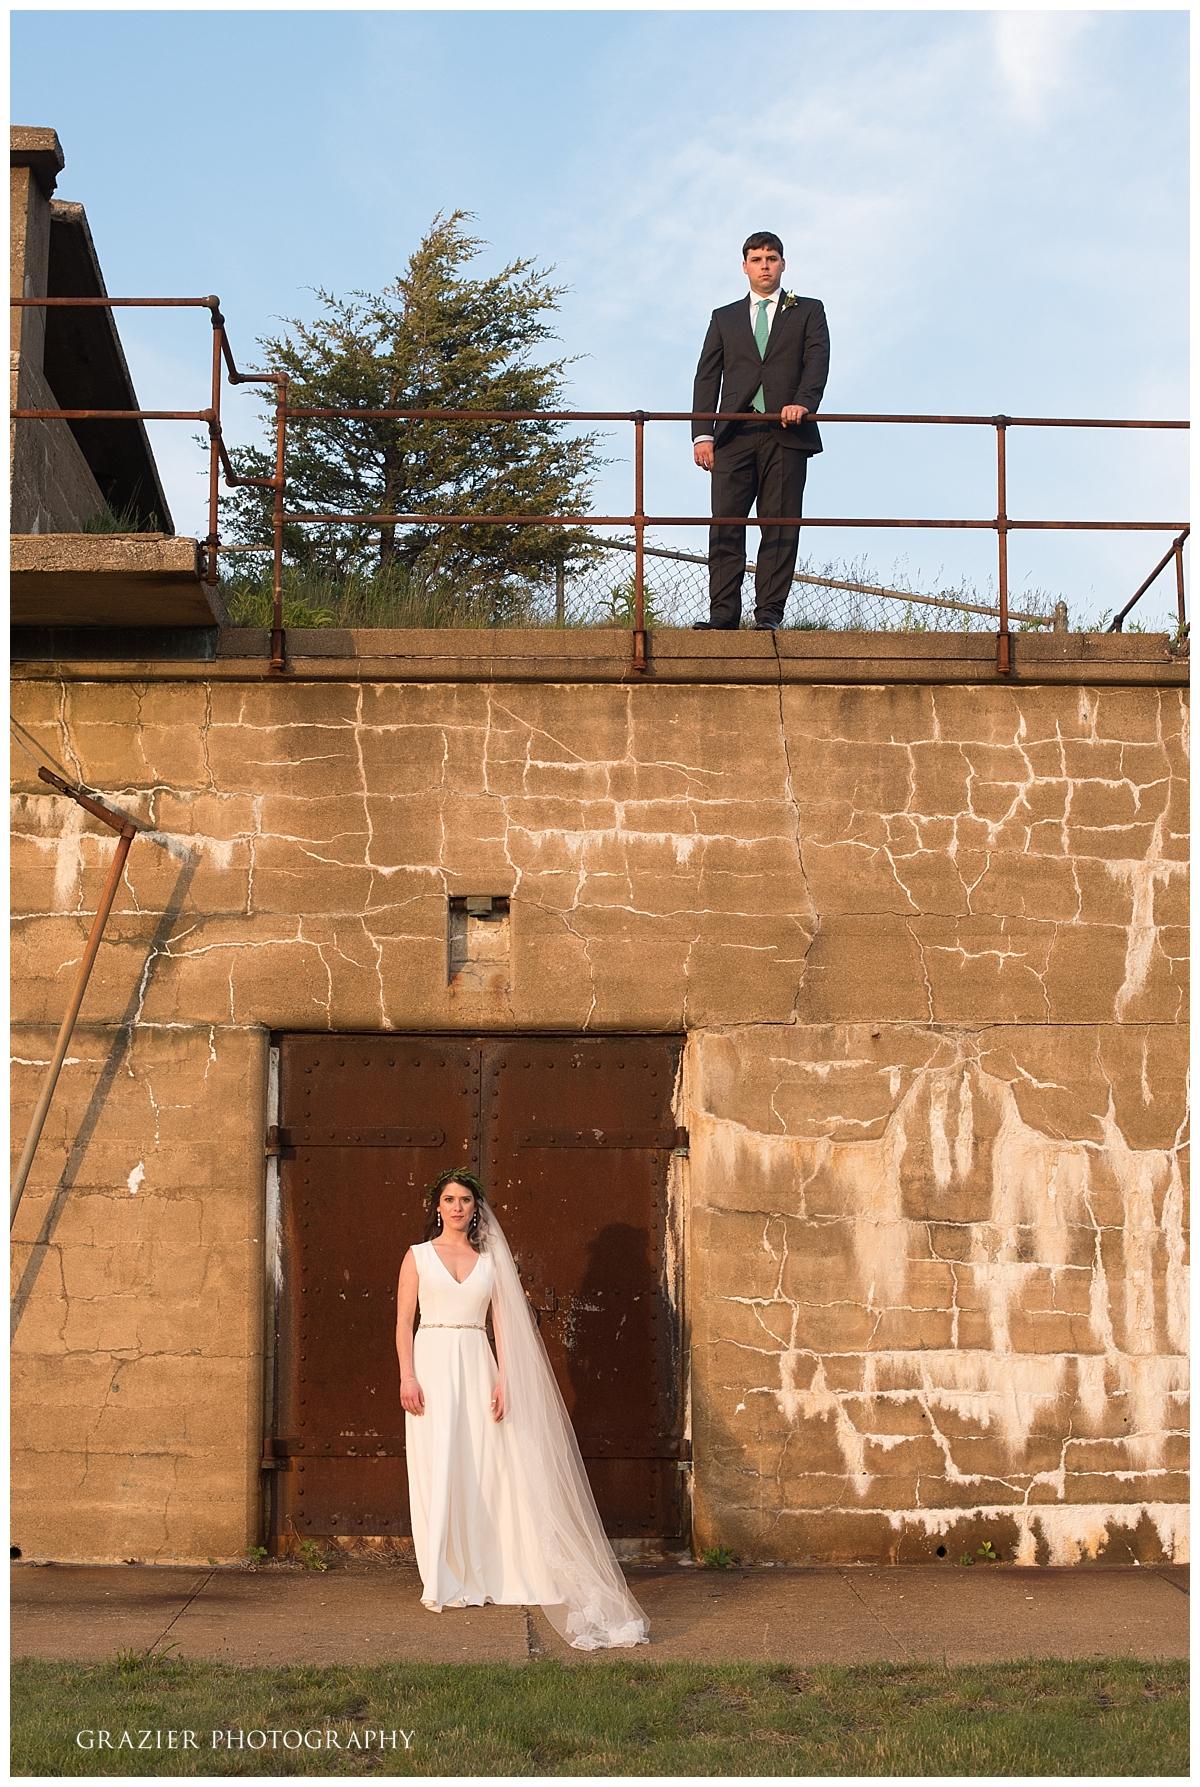 New Castle Wedding Grazier Photography 2017-79_WEB.jpg